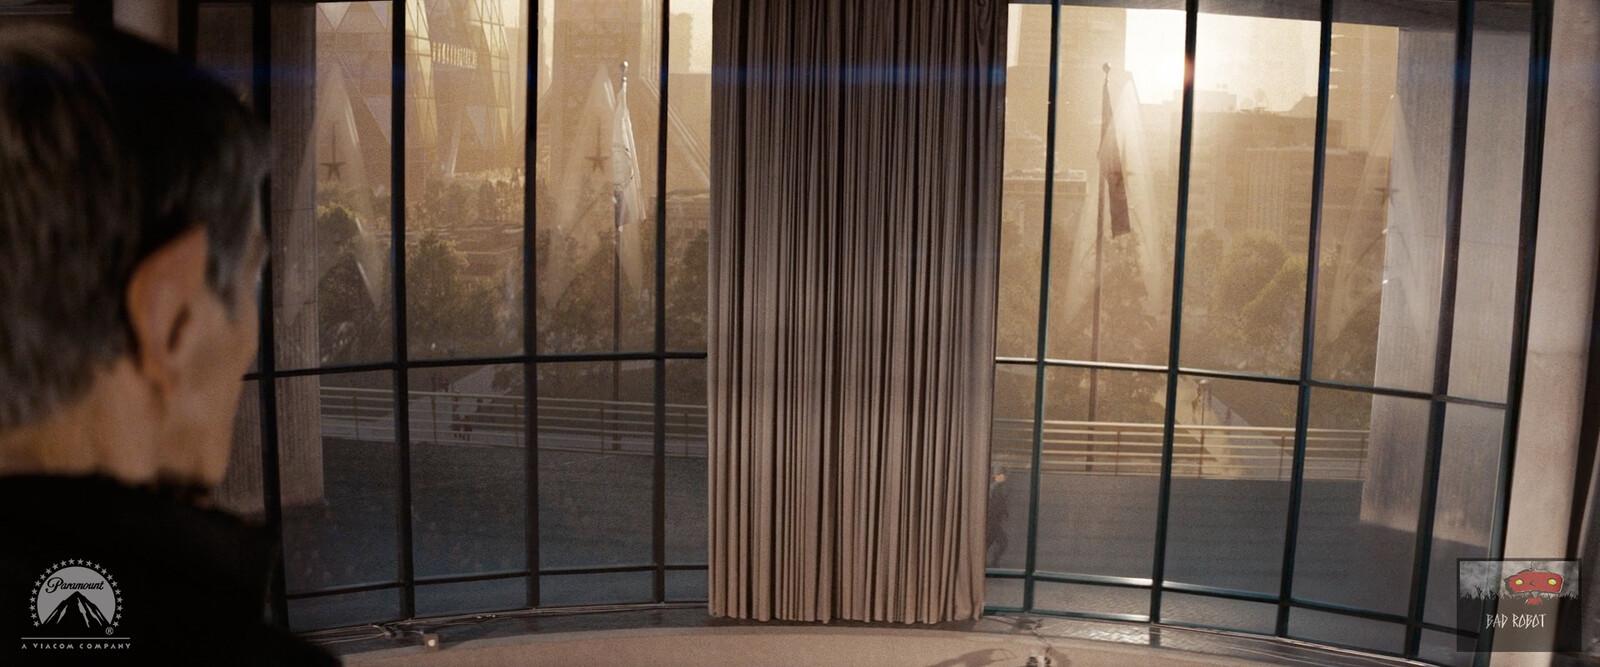 Exterior environment 2.5D Digital Matte Painting, with windows reconstruction and Starfleet window glass emboss.